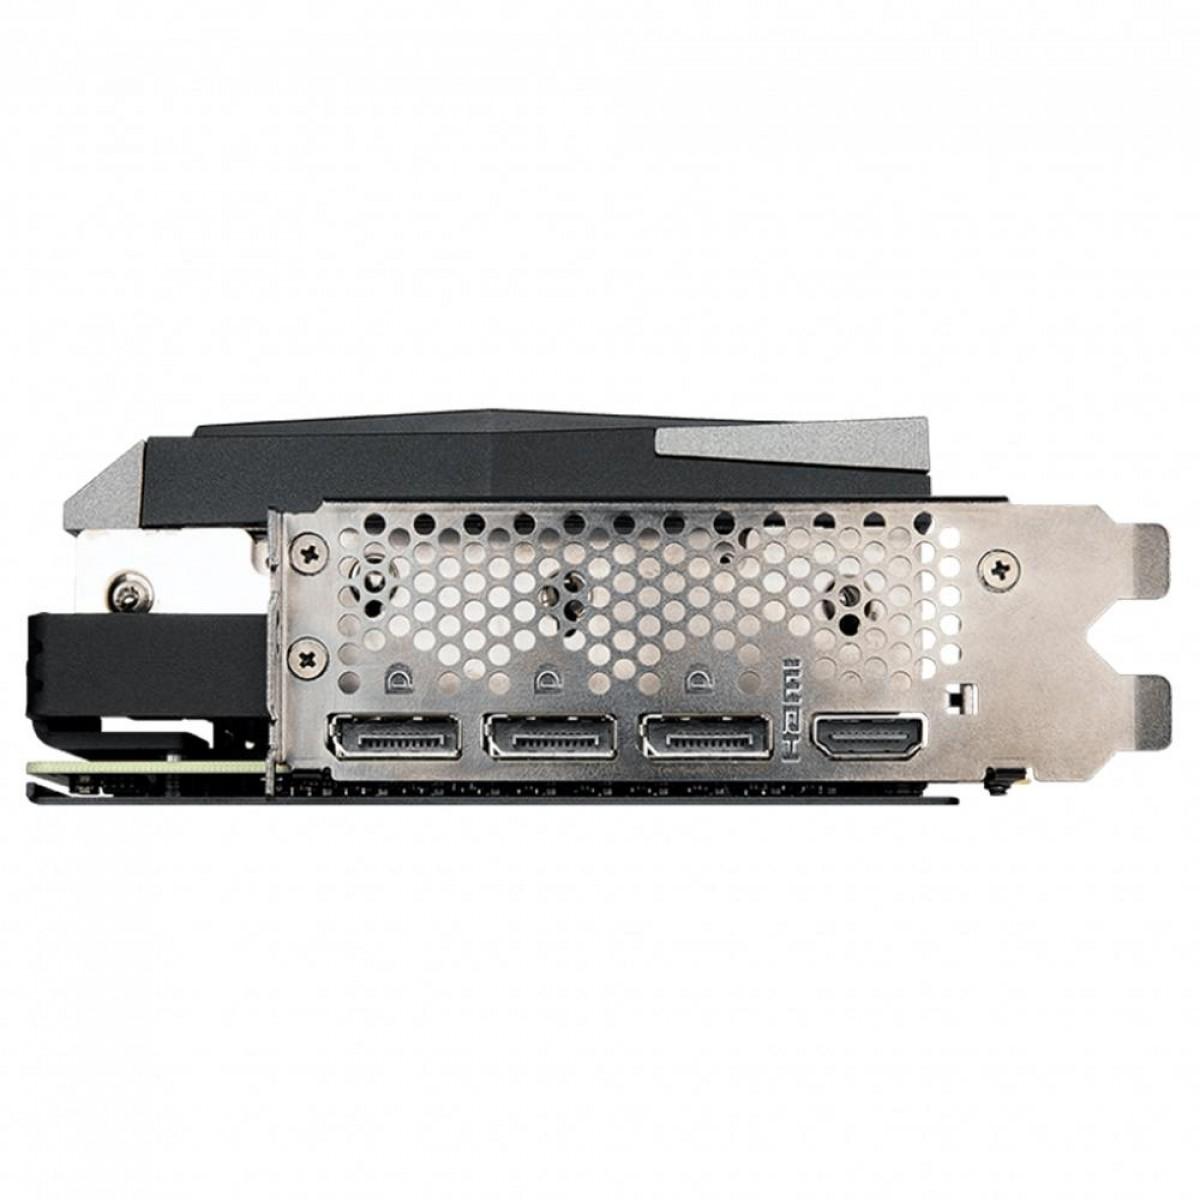 Placa de Vídeo MSI GeForce, RTX 3070 Gaming X Trio, 8GB GDDR6, 256Bit